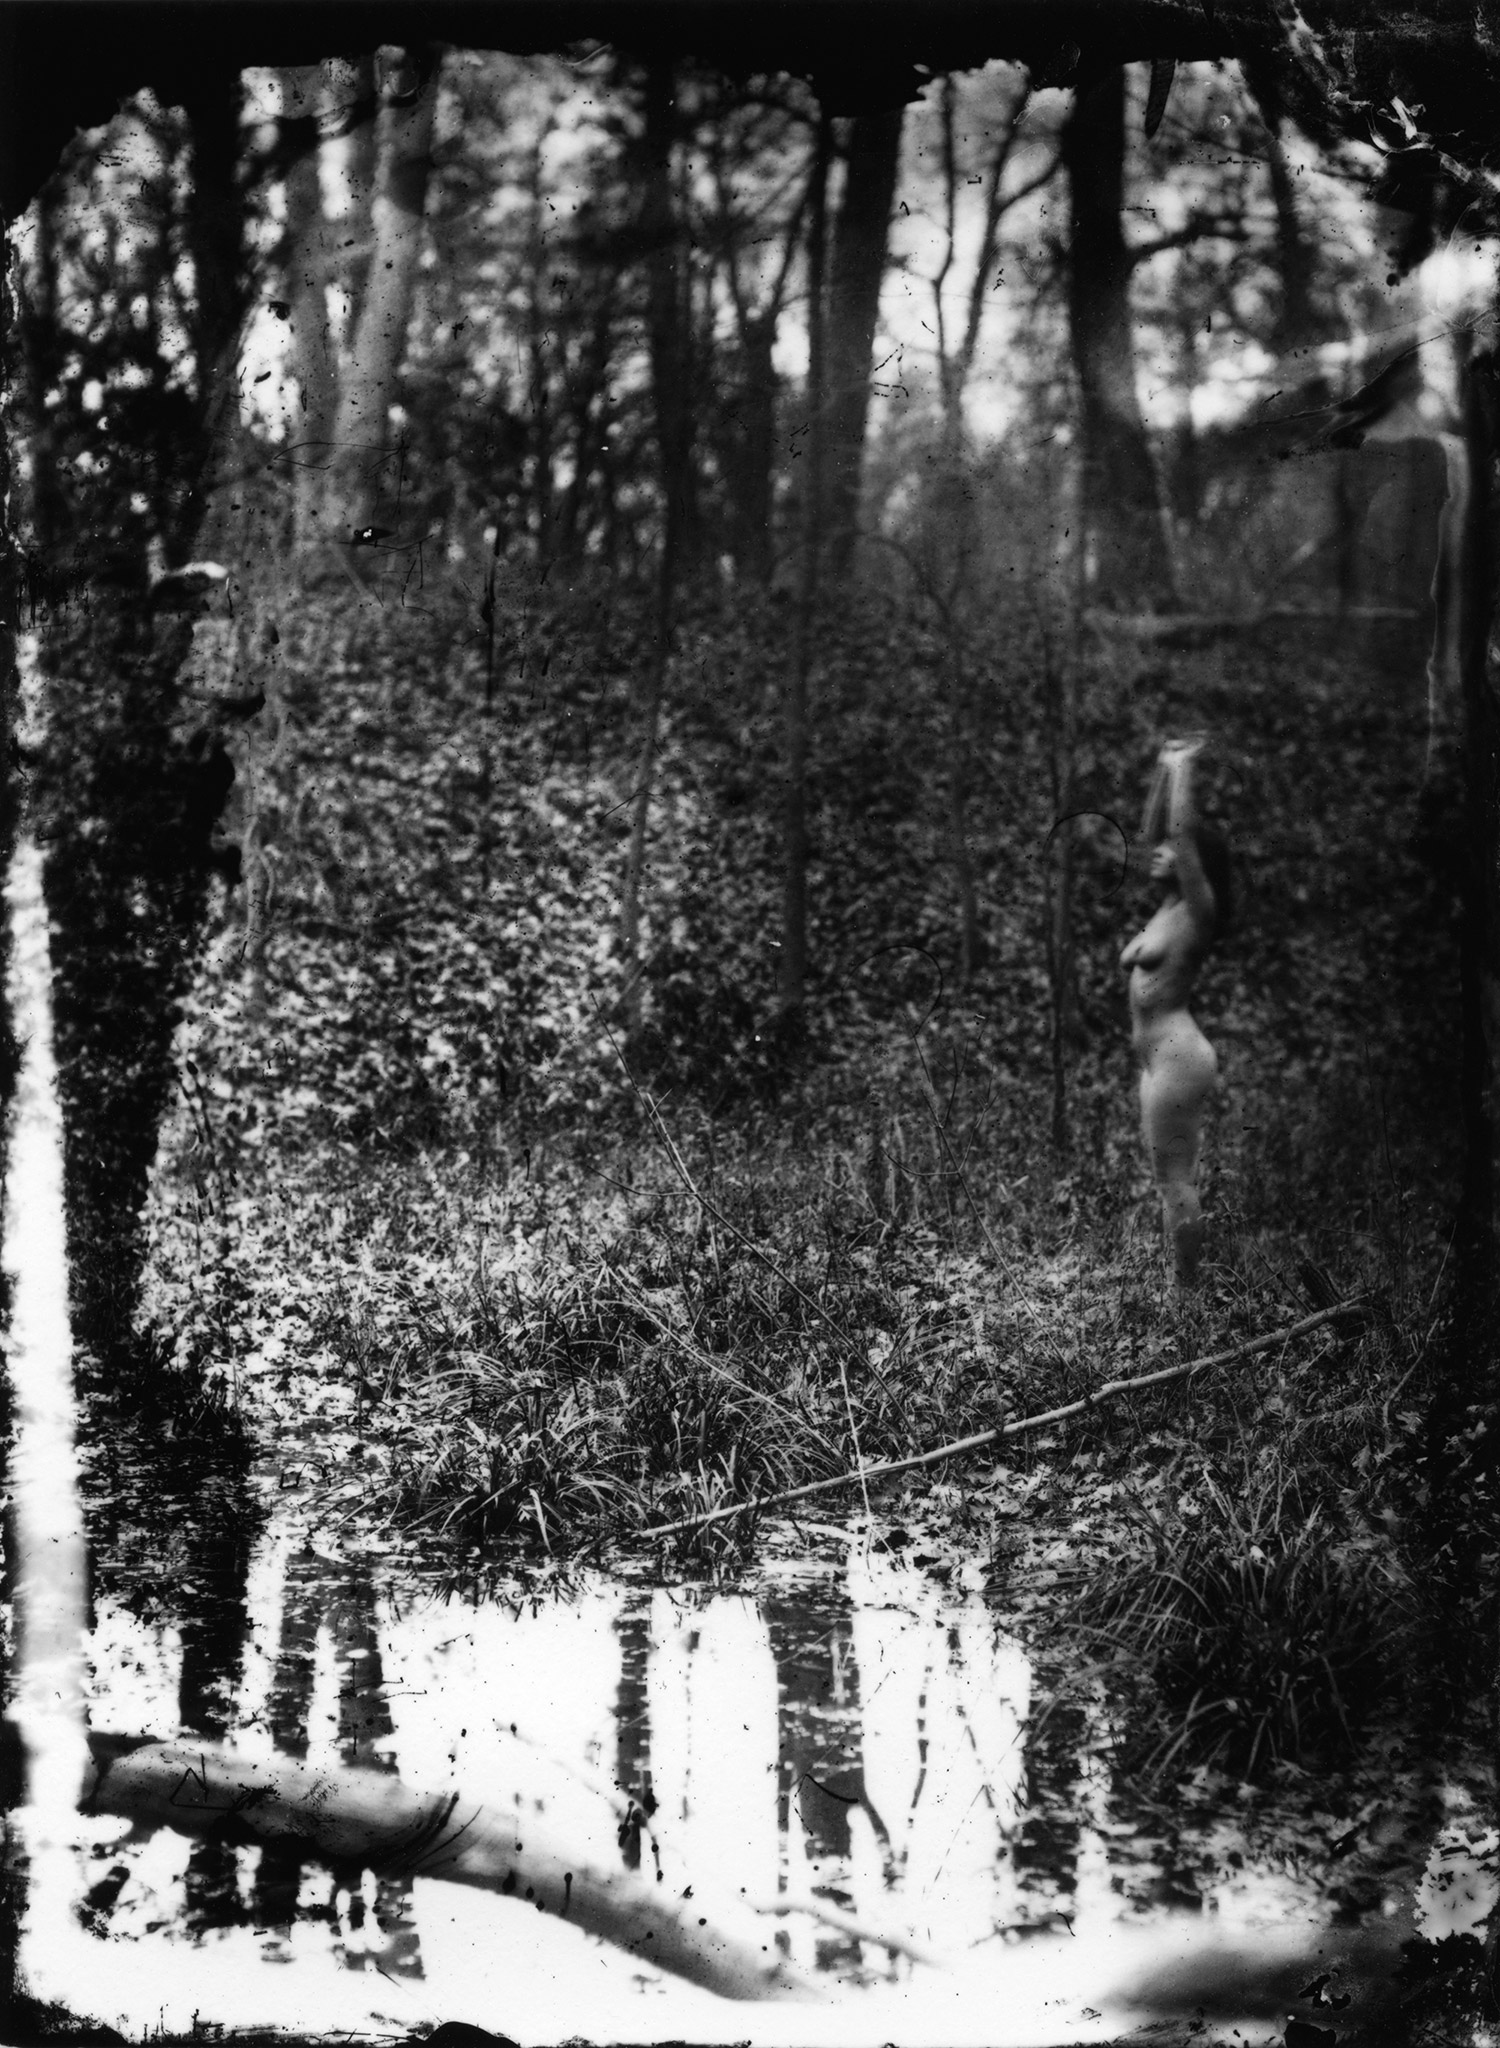 Rik Garrett, Earth Magic - spectral figure in forest